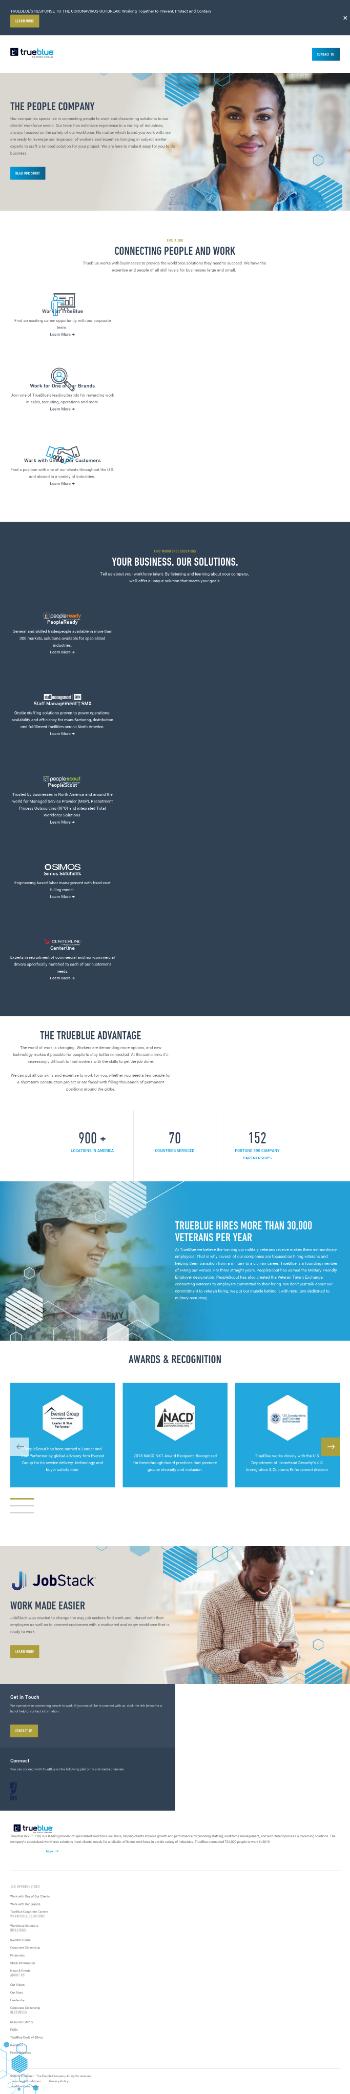 TrueBlue, Inc. Website Screenshot